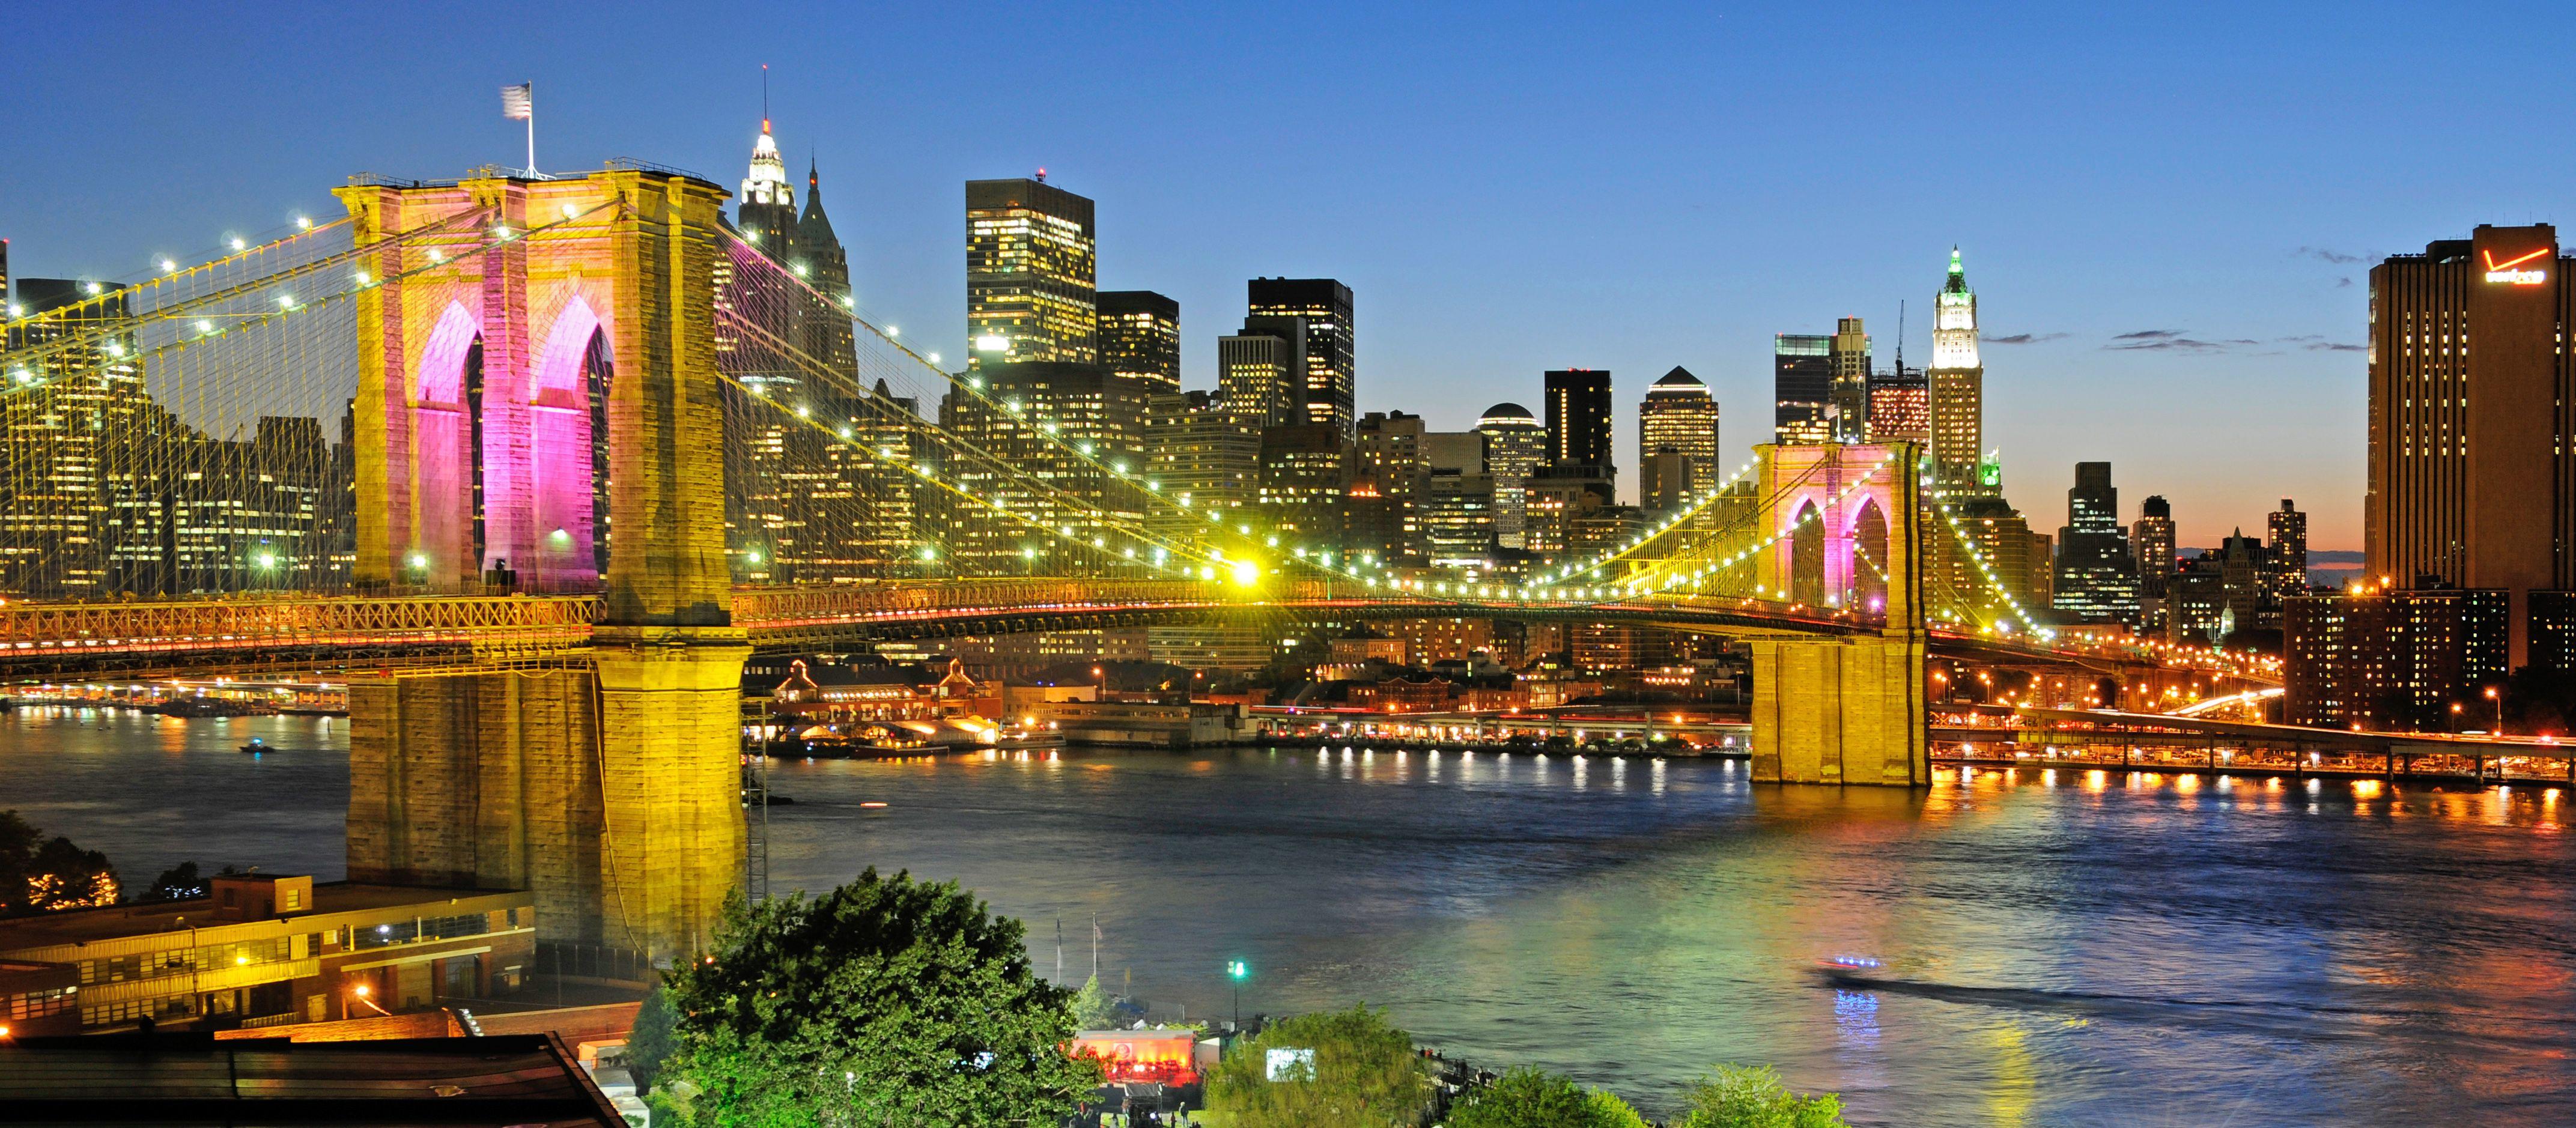 Nacht im Brooklyn Bridge Park